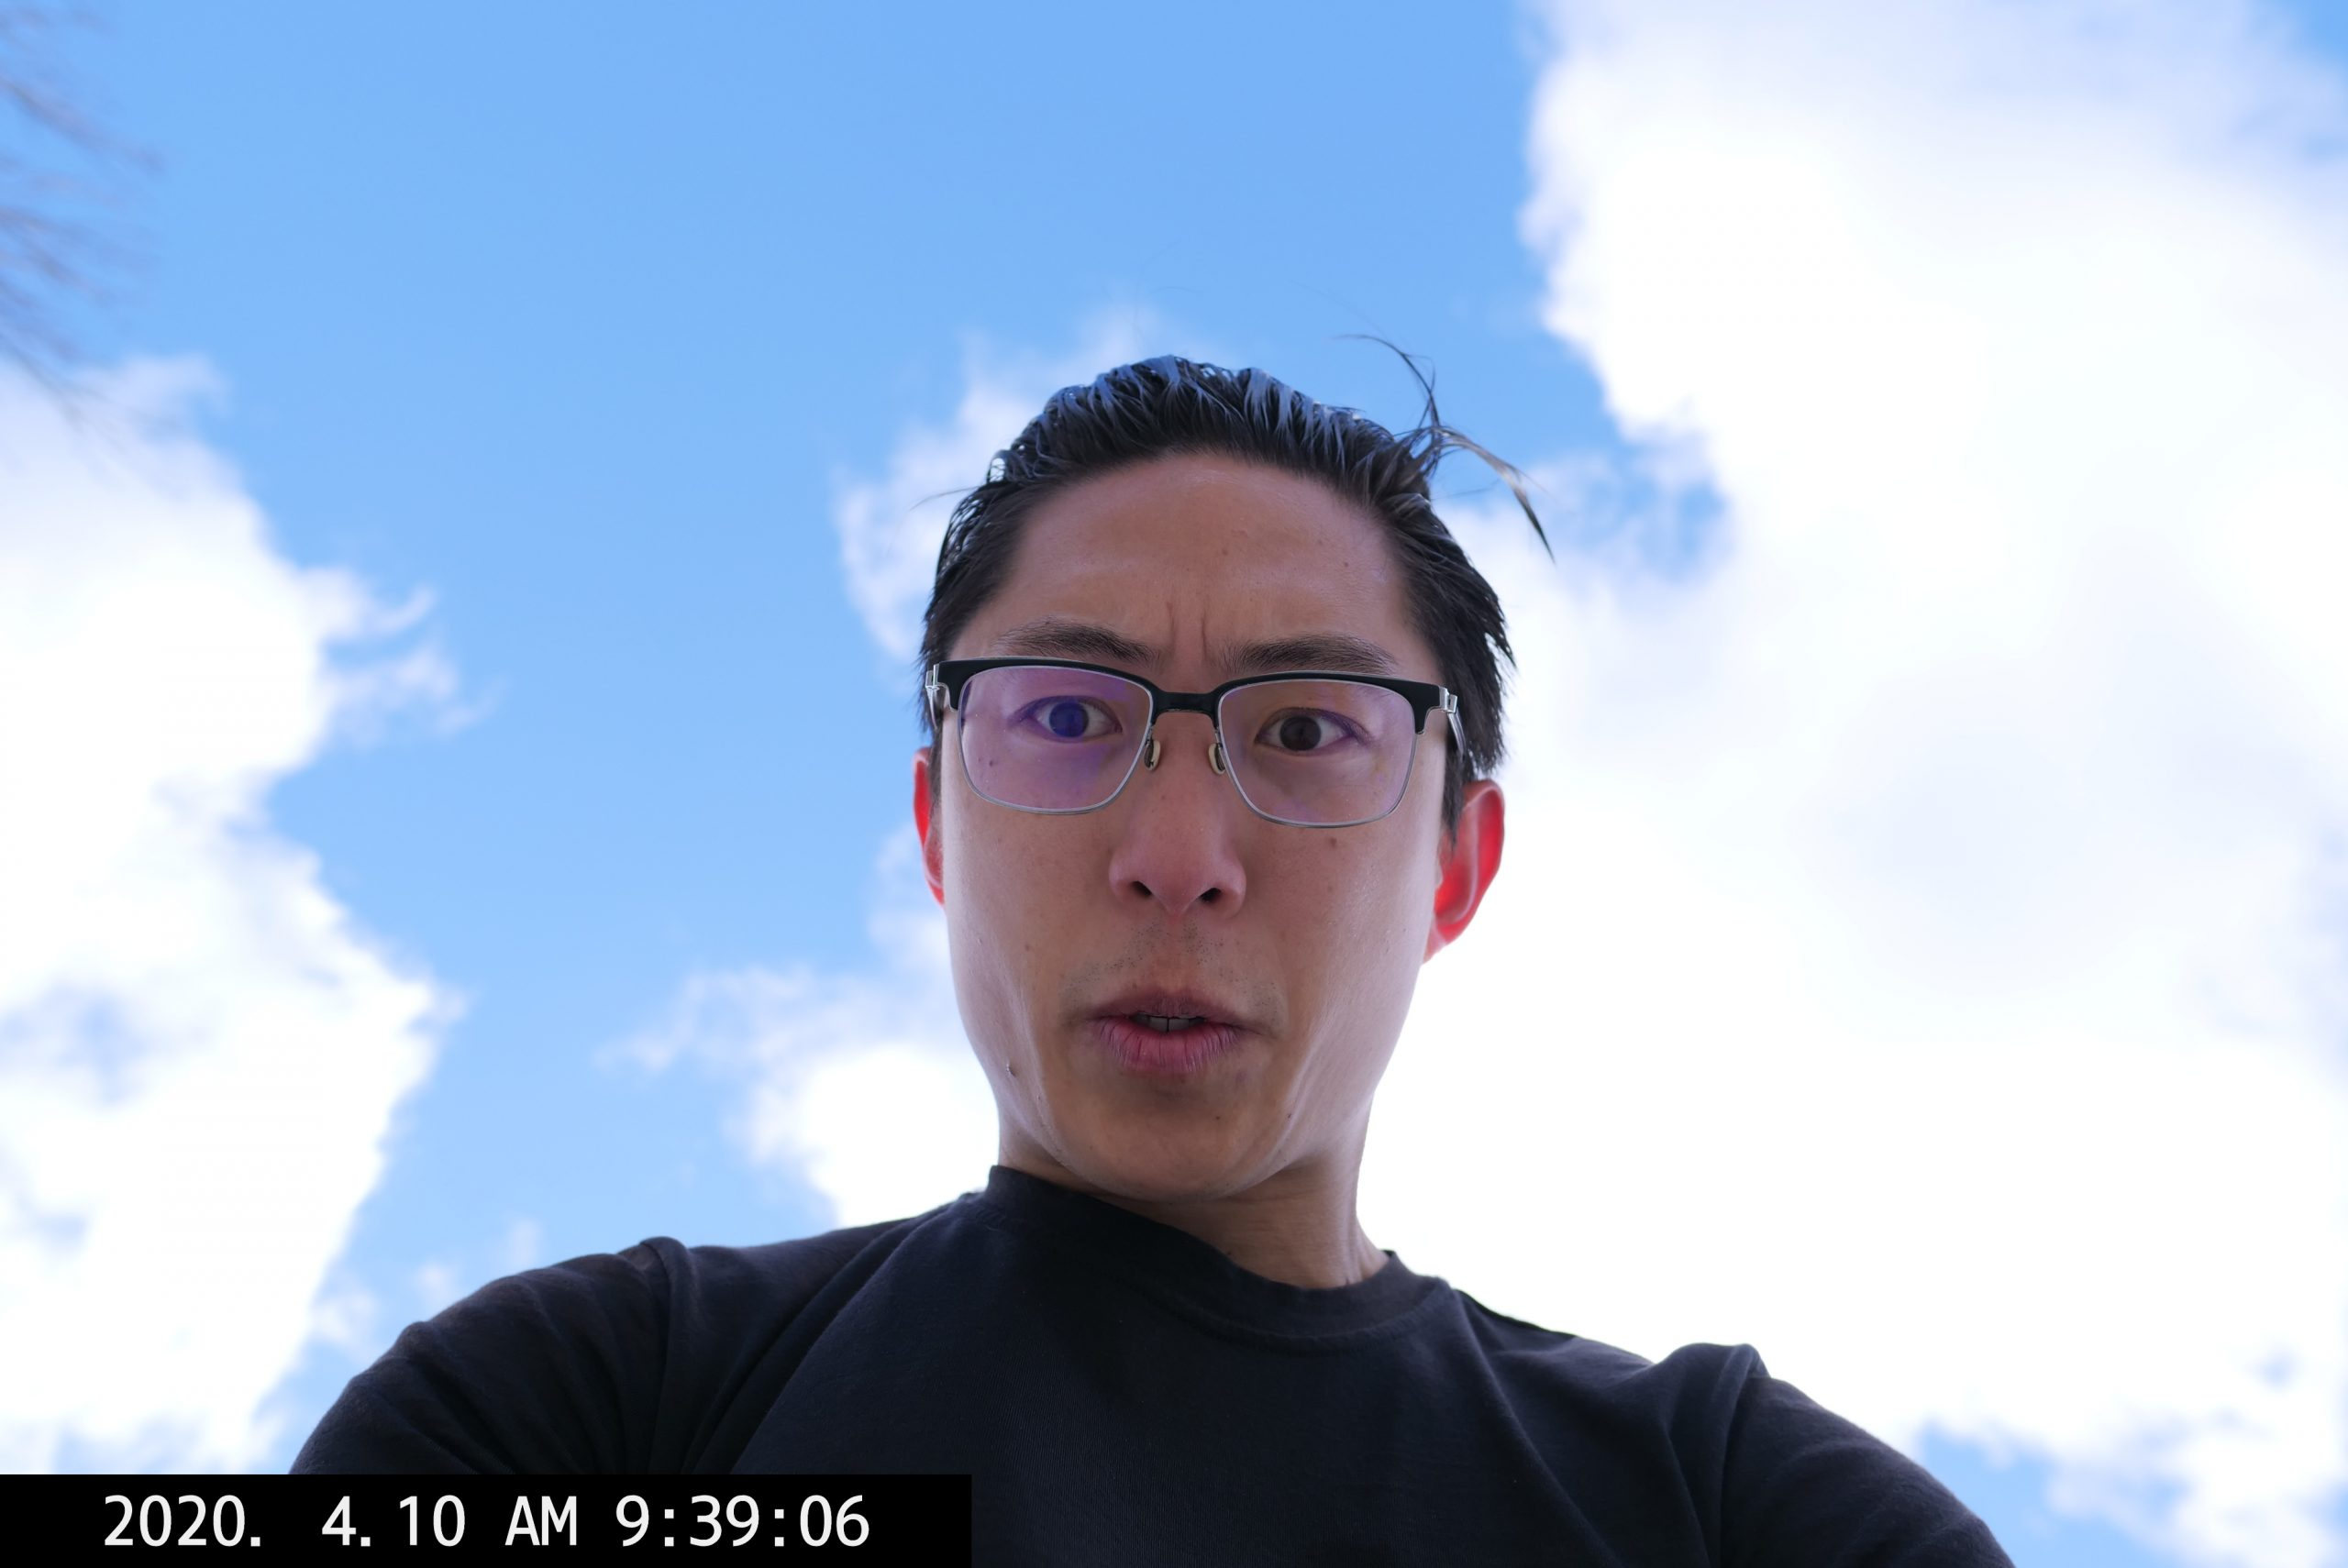 win ERIC KIM selfie